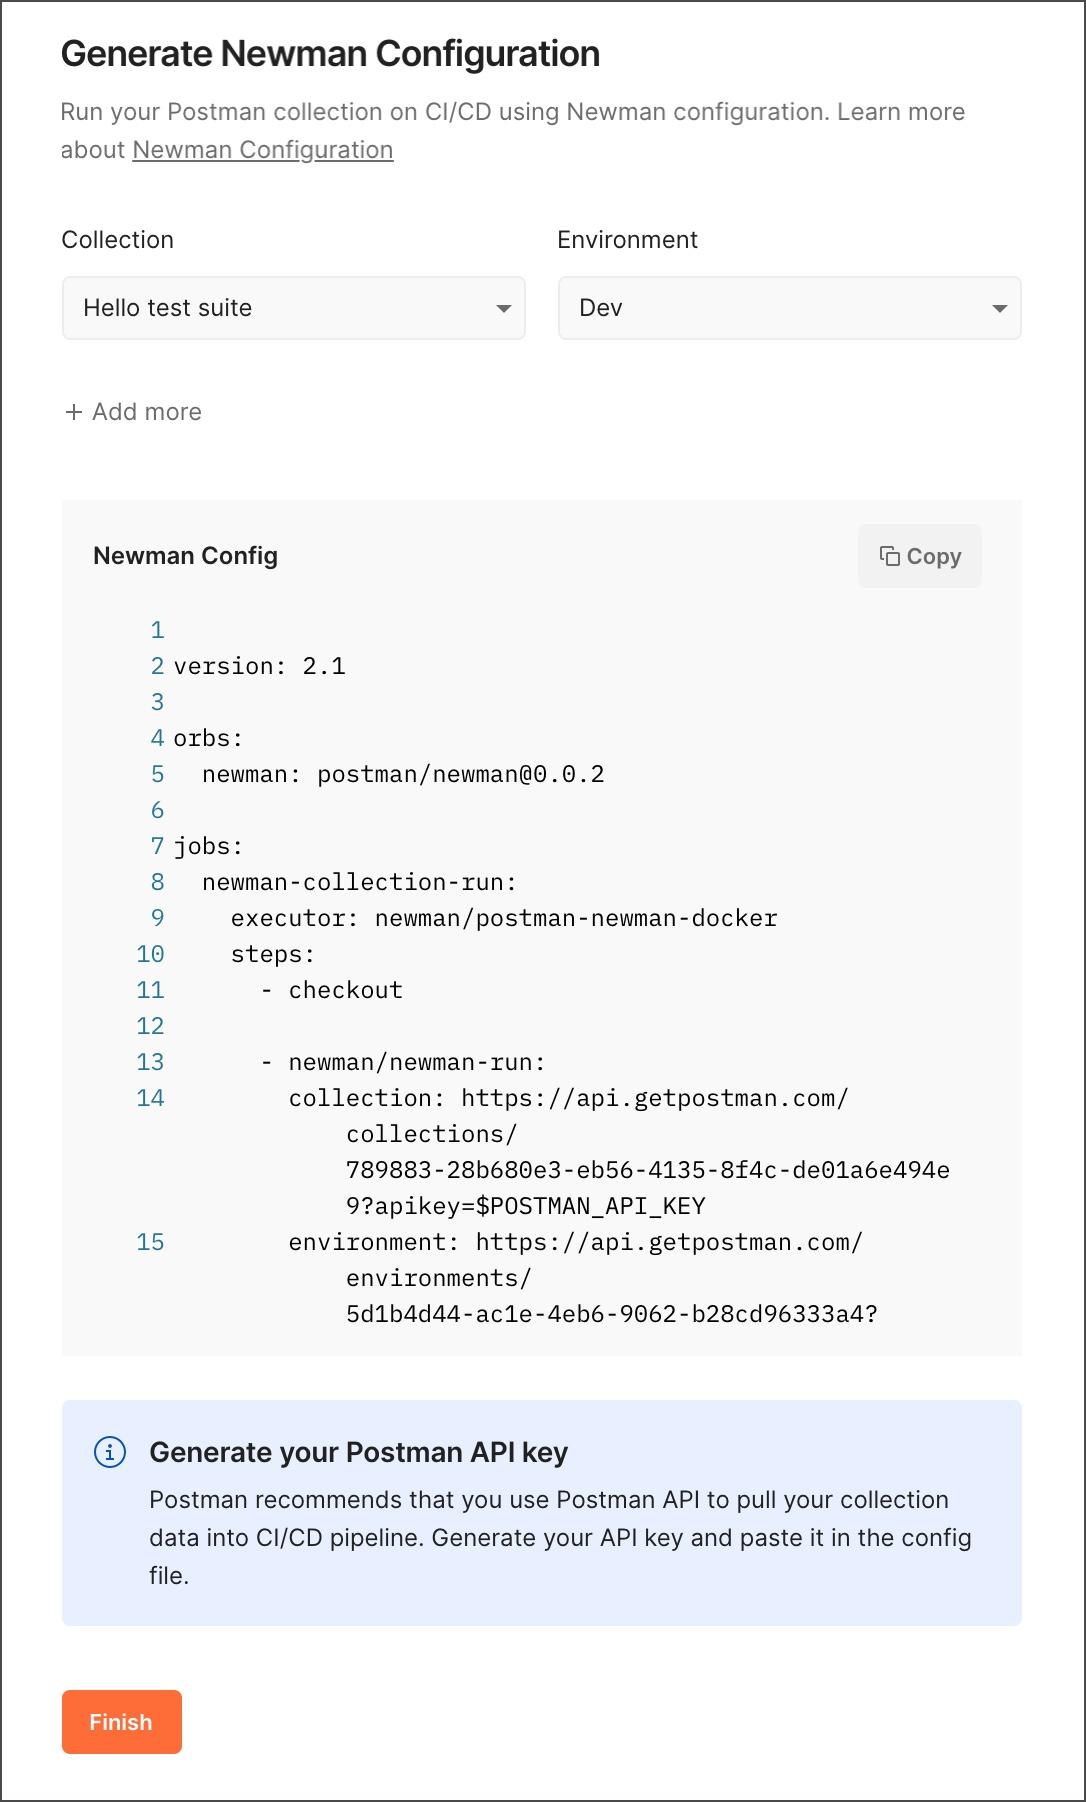 Generate Newman configuration for CI